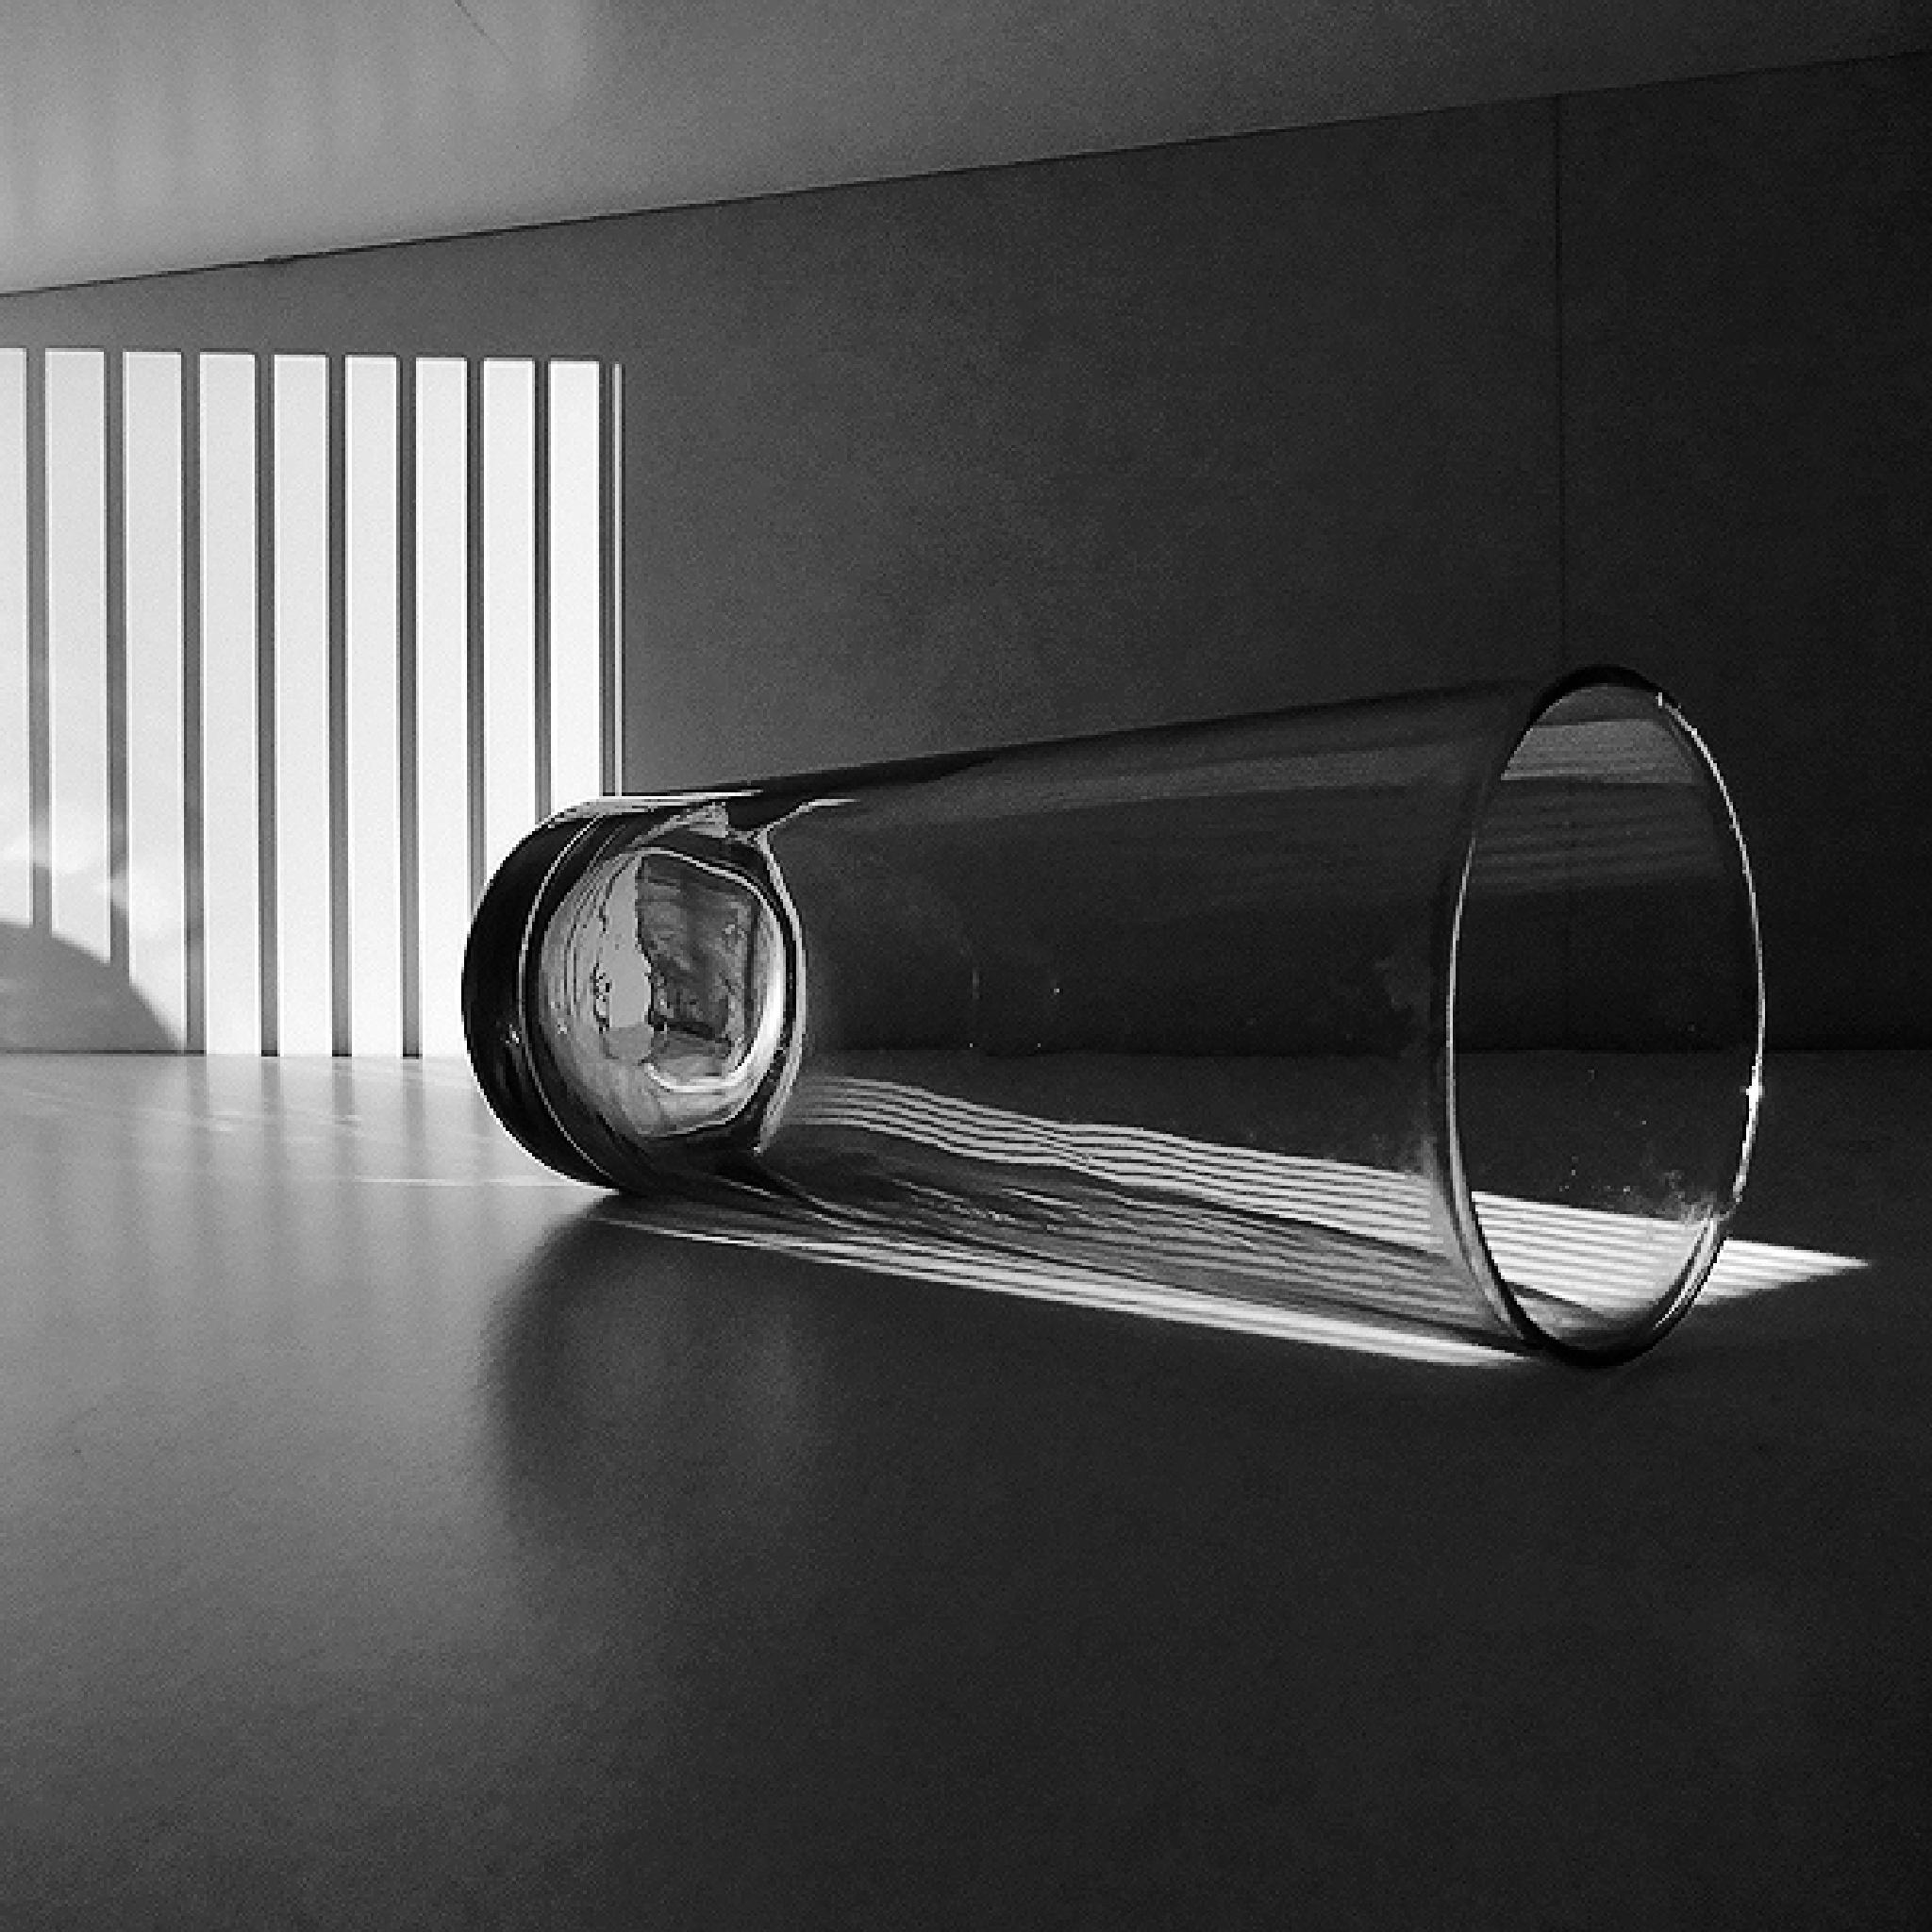 untitled by Gernot Schwarz